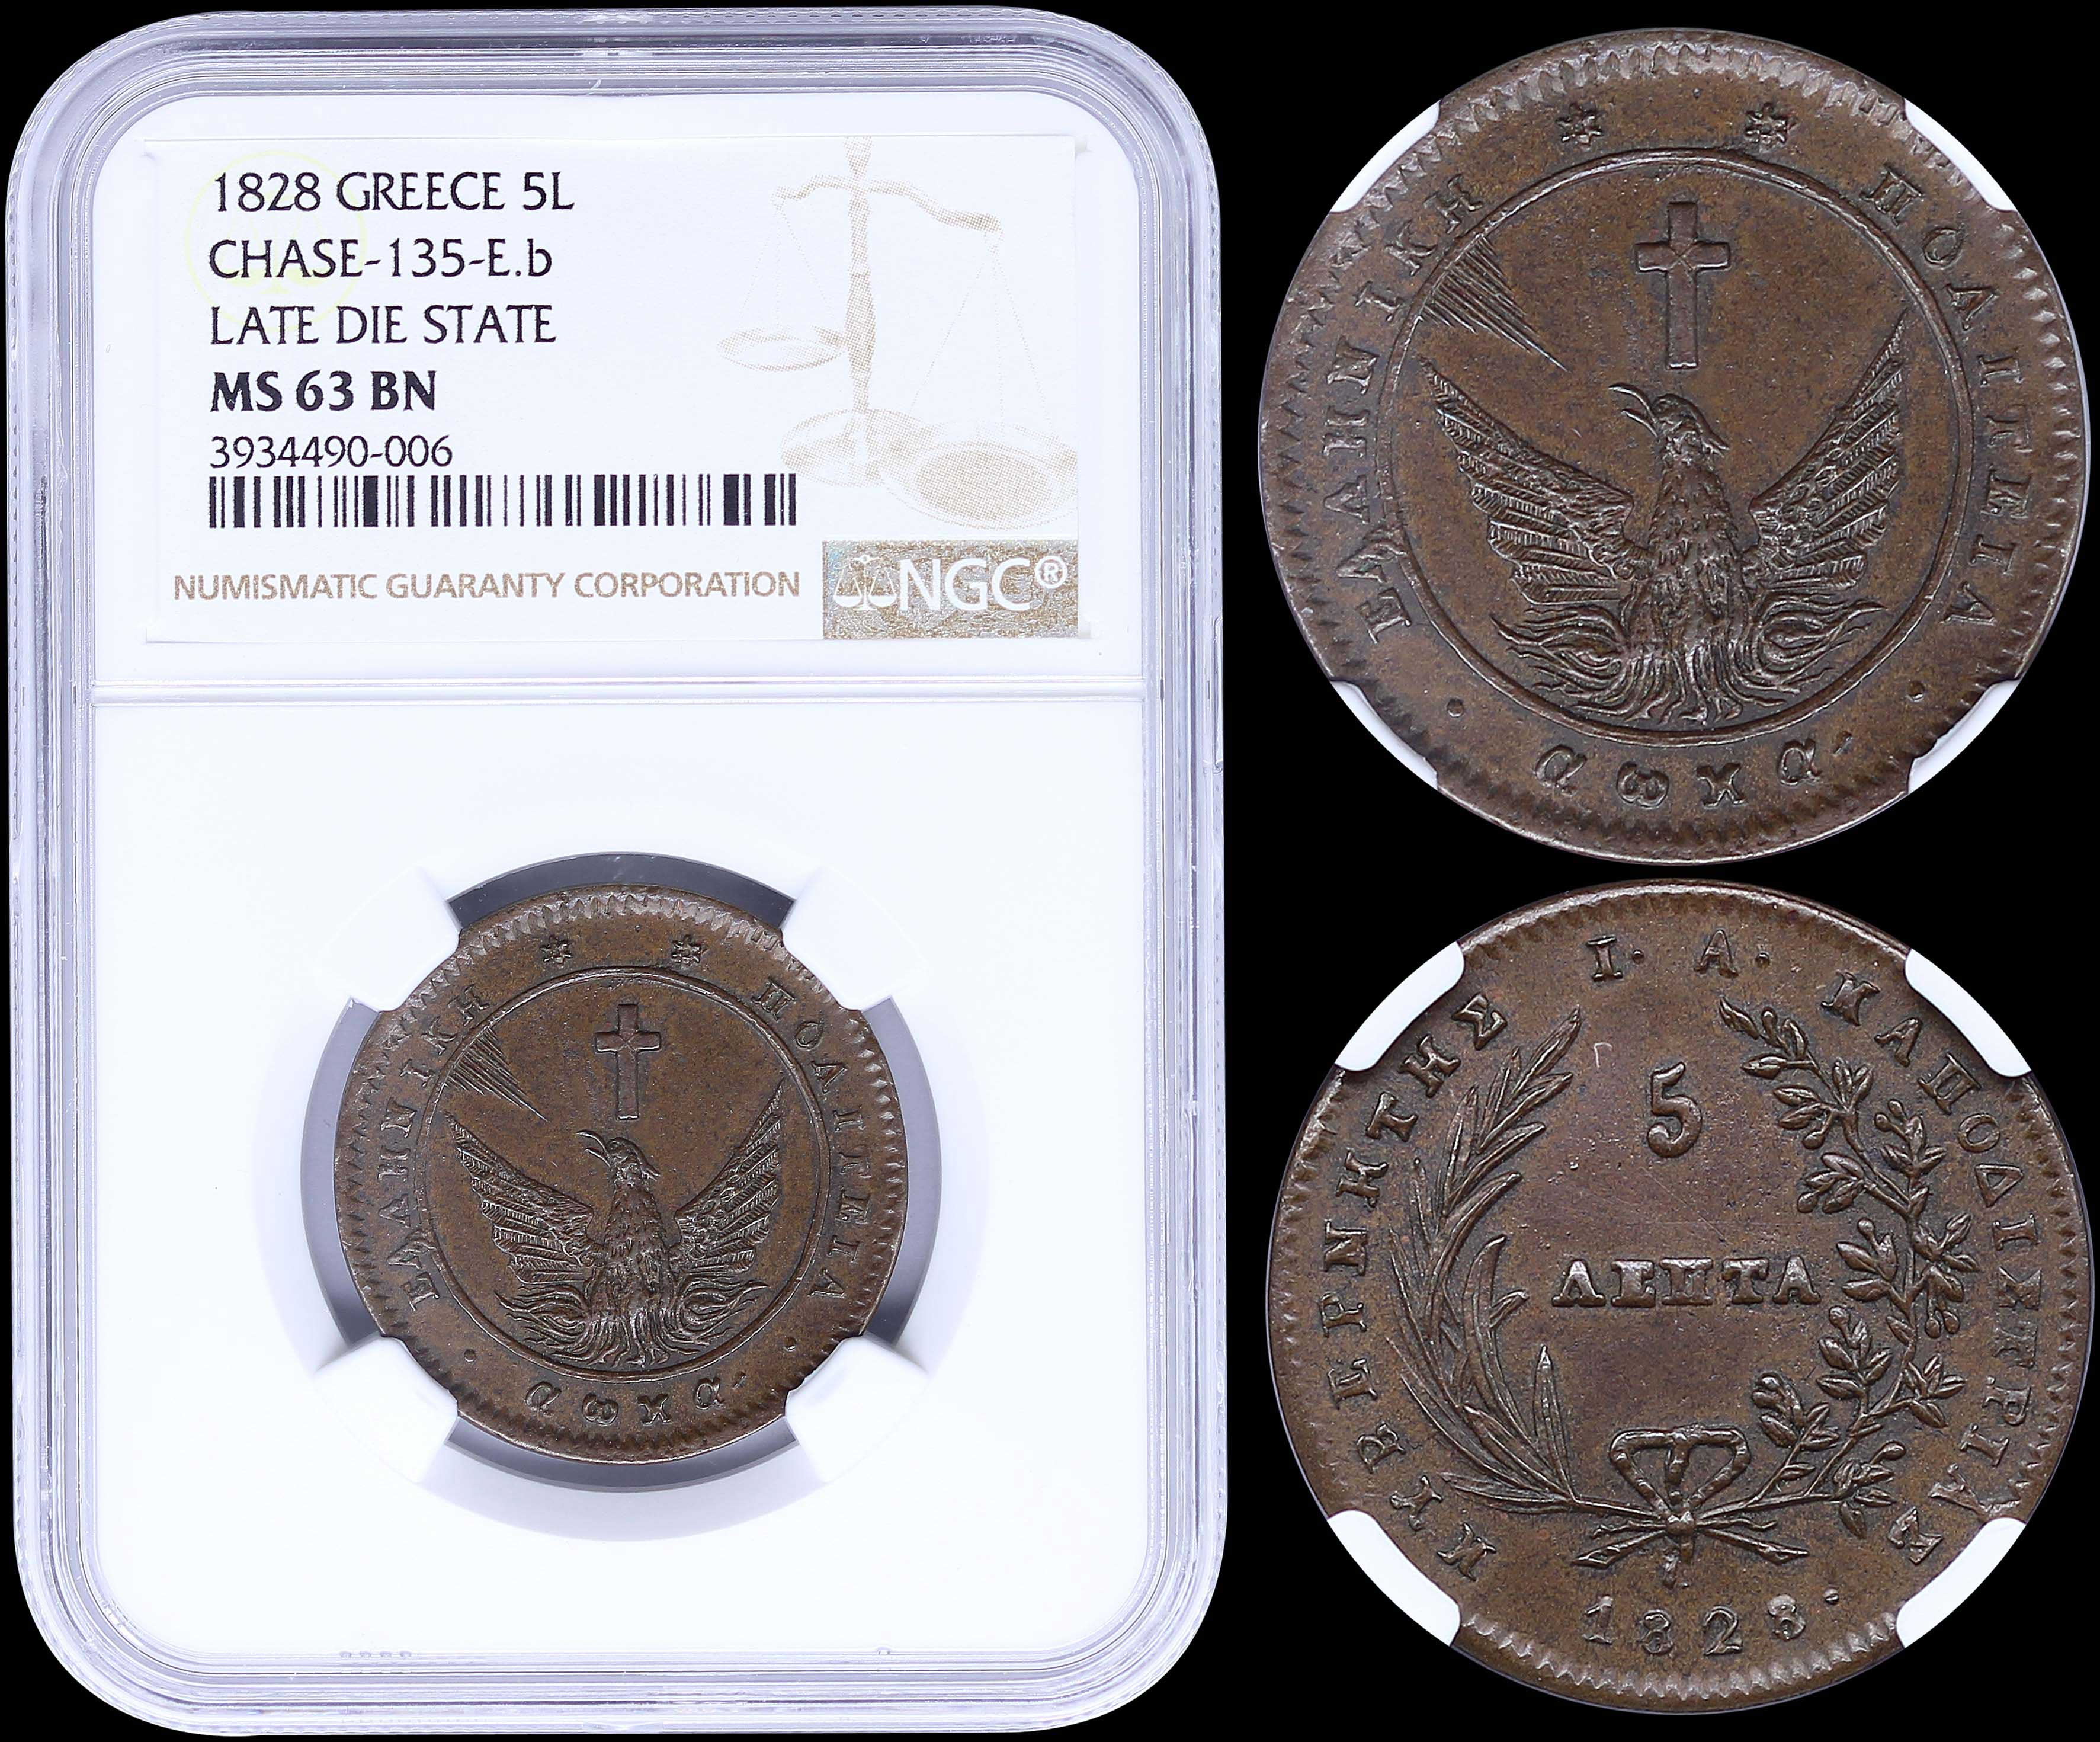 Lot 3011 - GREECE-  COINS & TOKENS governor capodistrias -  A. Karamitsos Public & LIVE Bid Auction 631 Coins, Medals & Banknotes